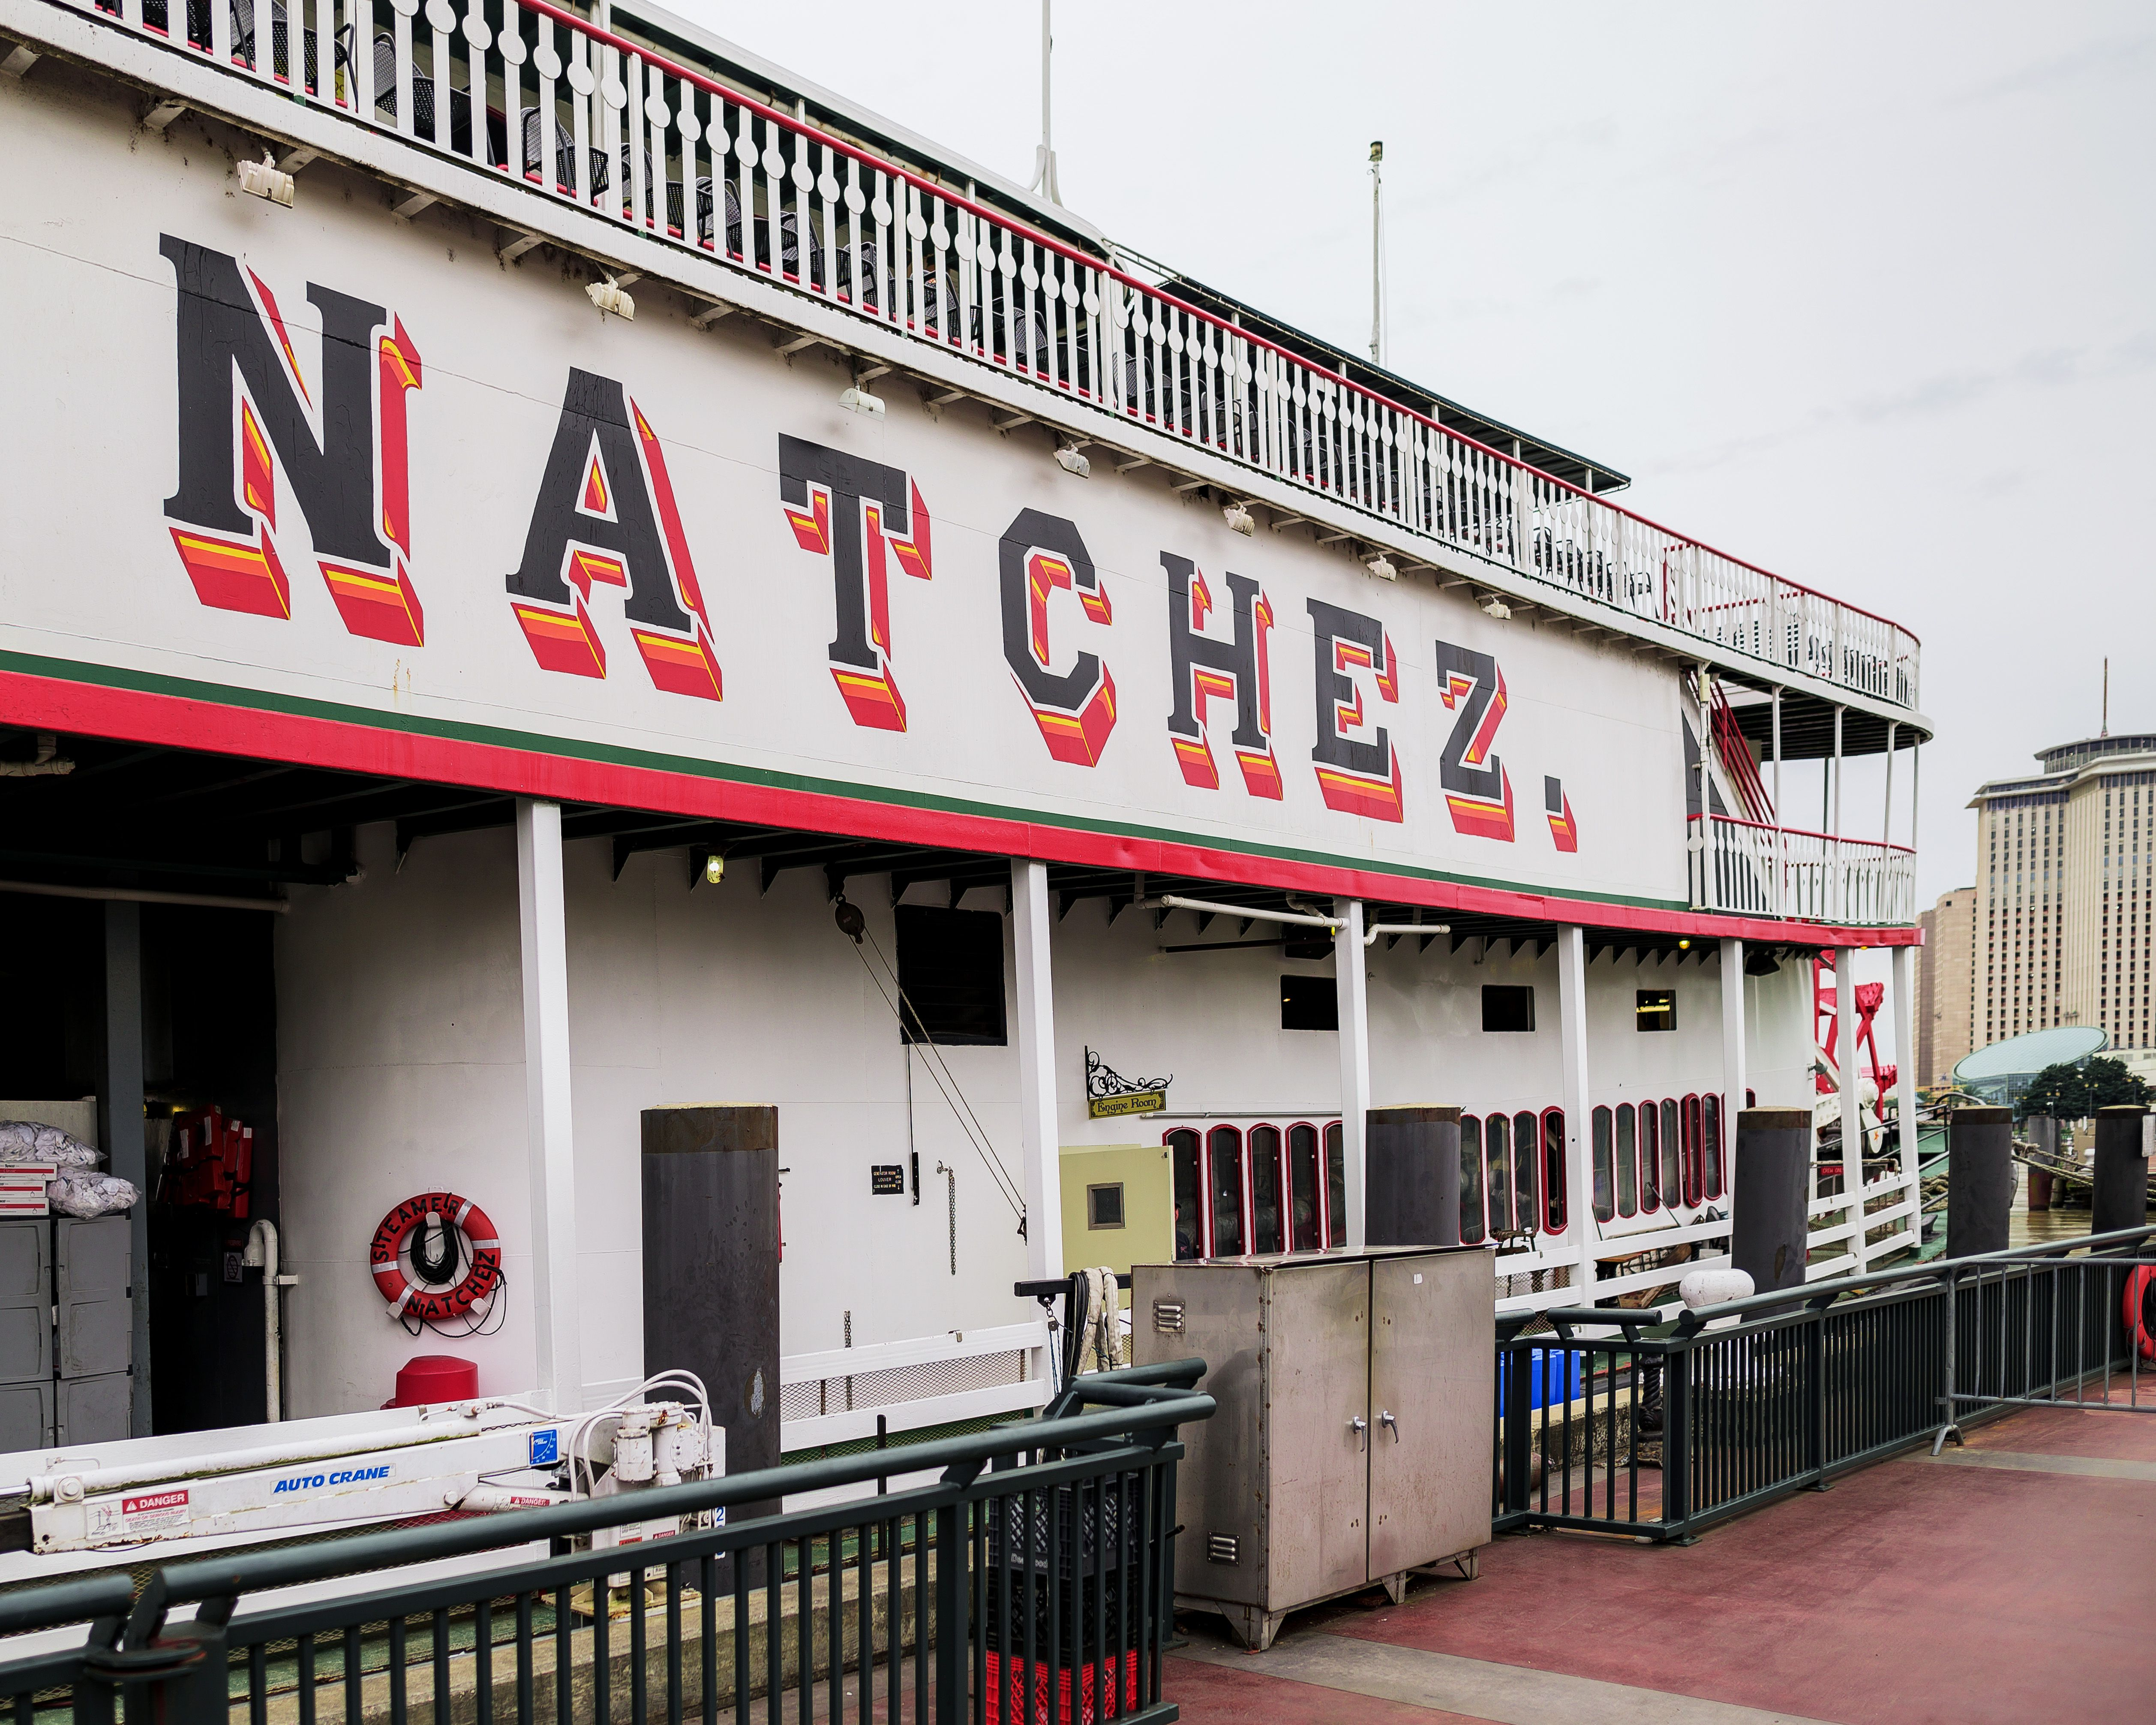 Natchez ferry